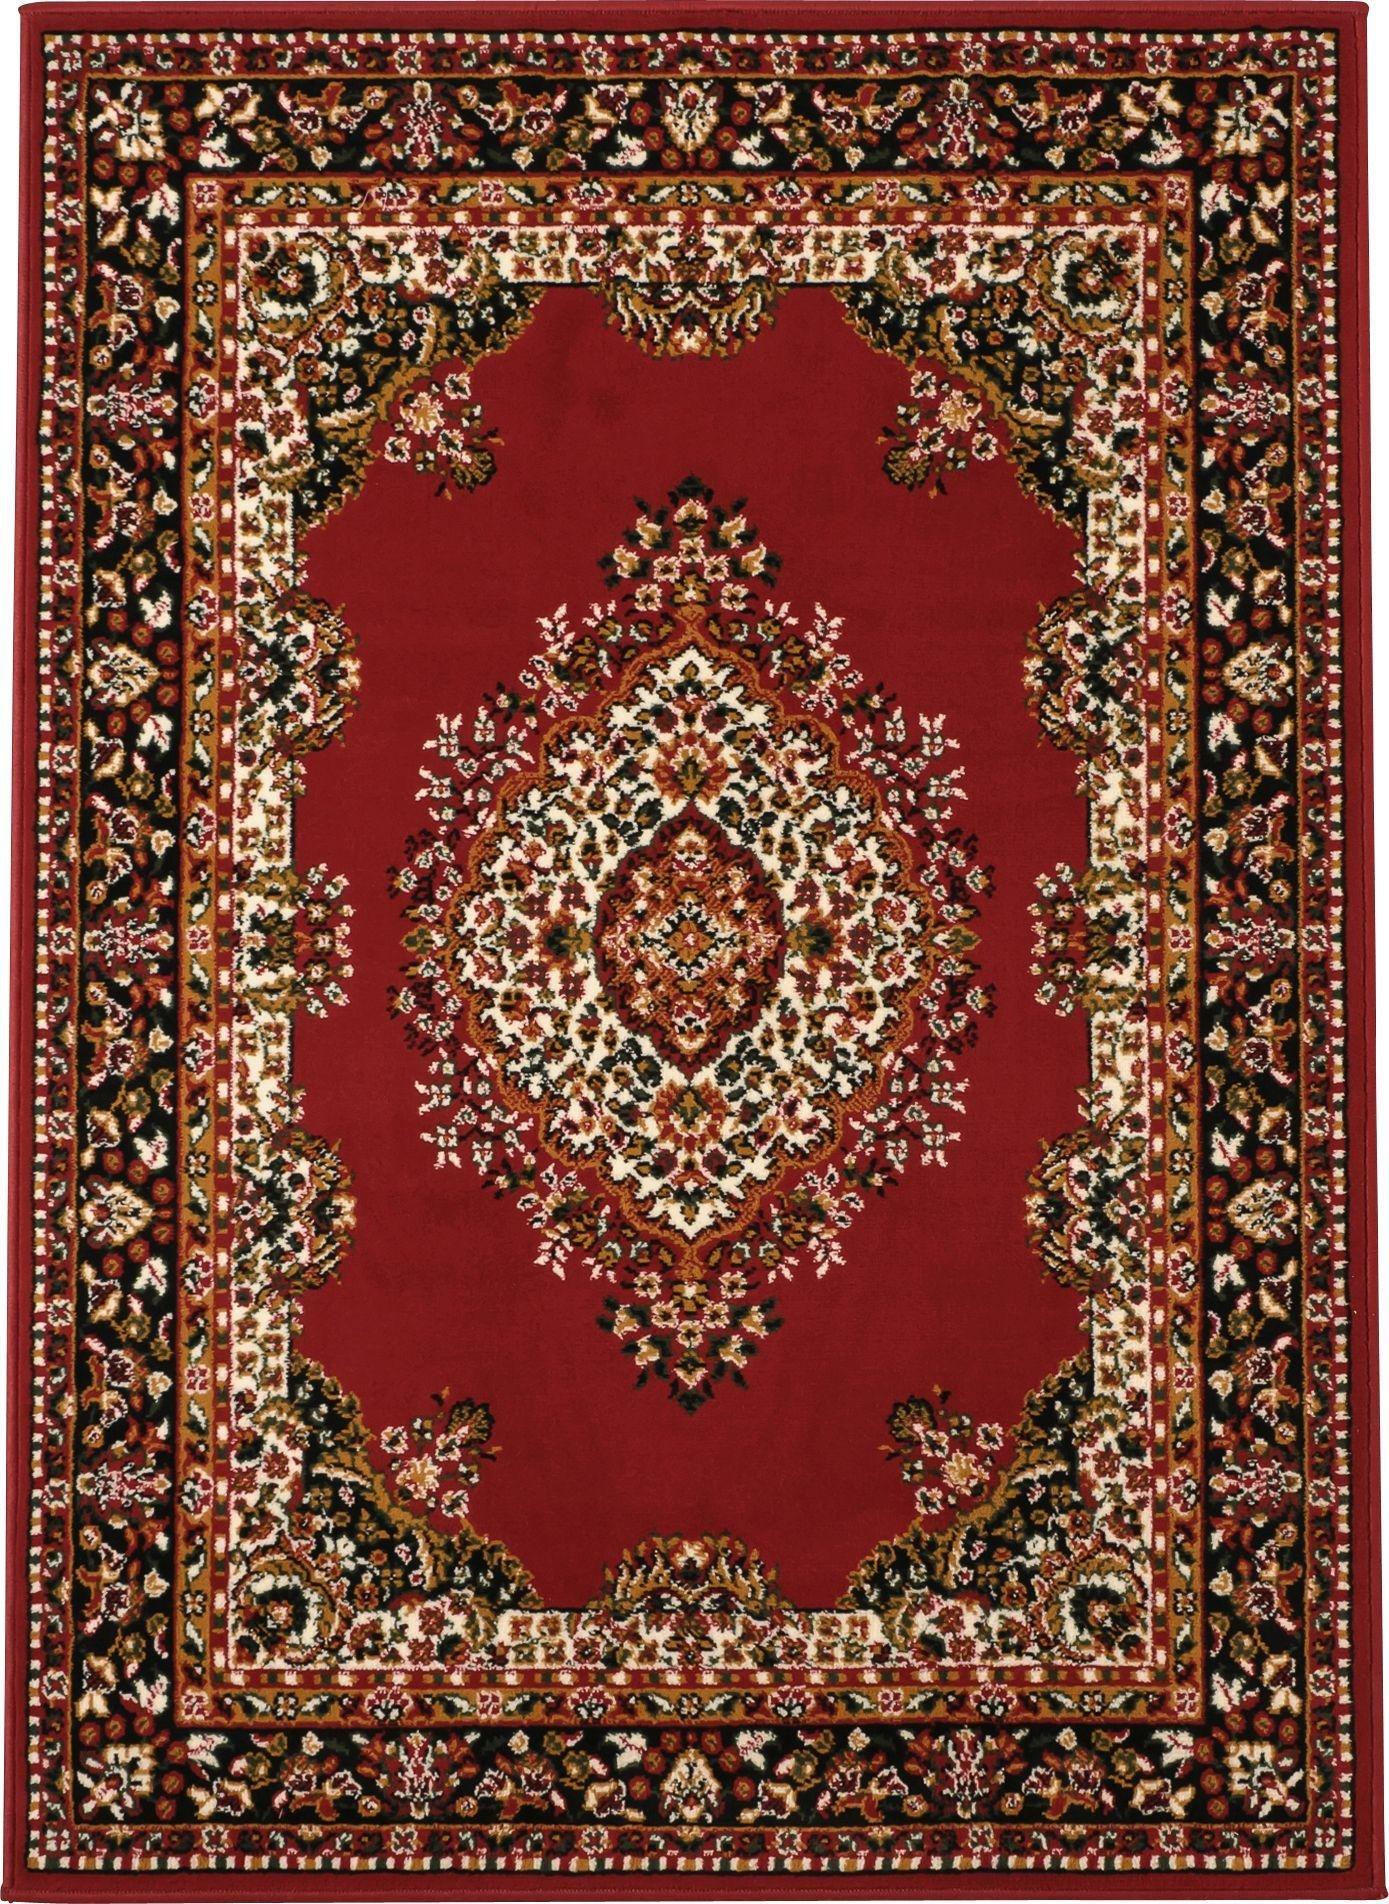 2417347_R_Z002A_UC1733335?$Web$u0026wu003d570u0026hu003d513 large patio rugs